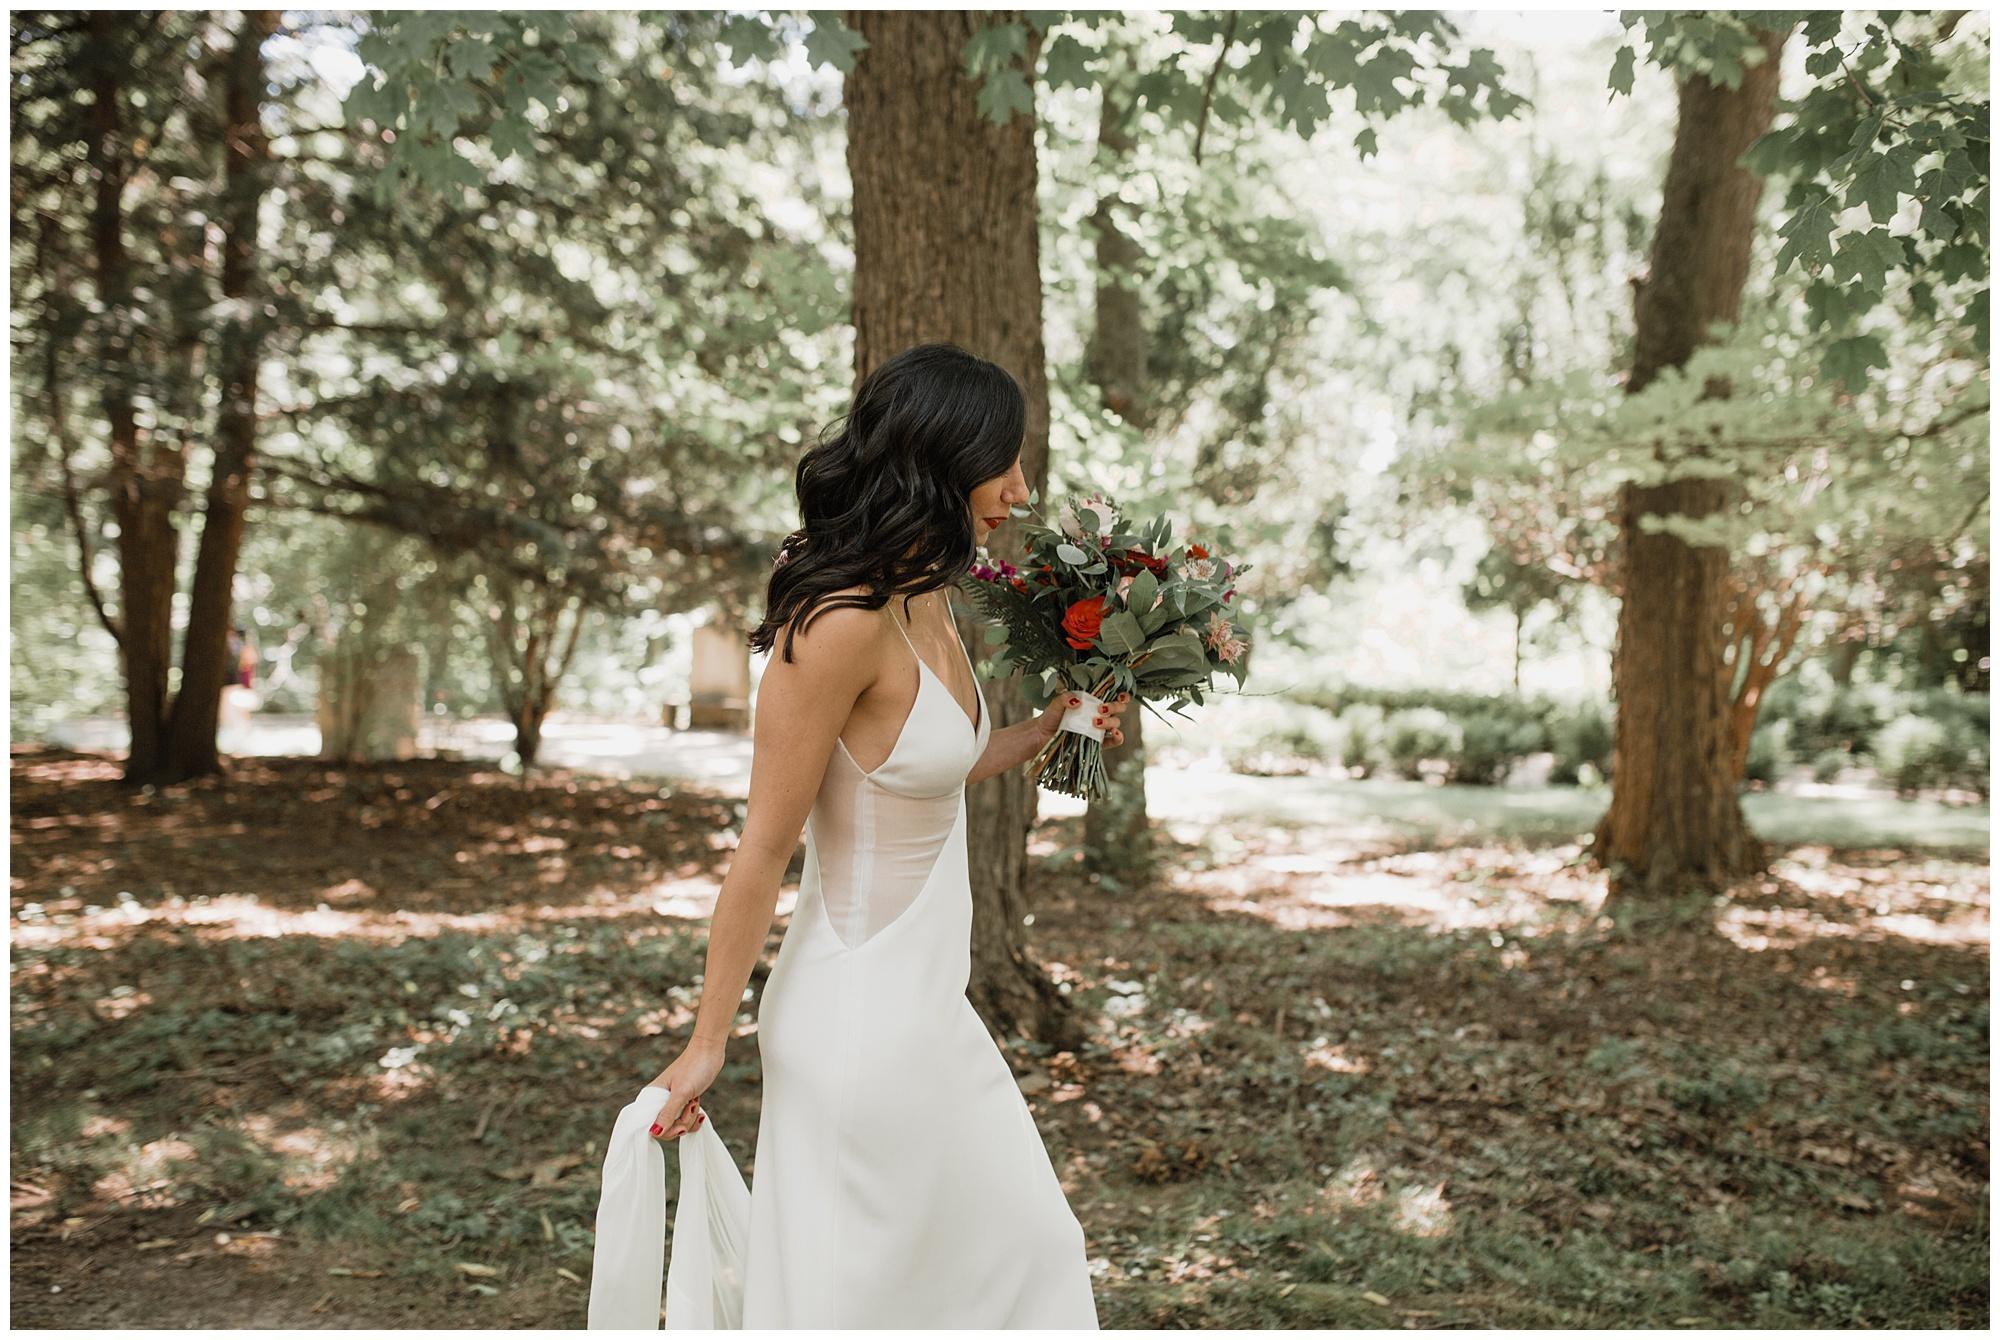 allerton_park_wedding_champaign_il_chicago_wright_photographs_ne_0047.jpg